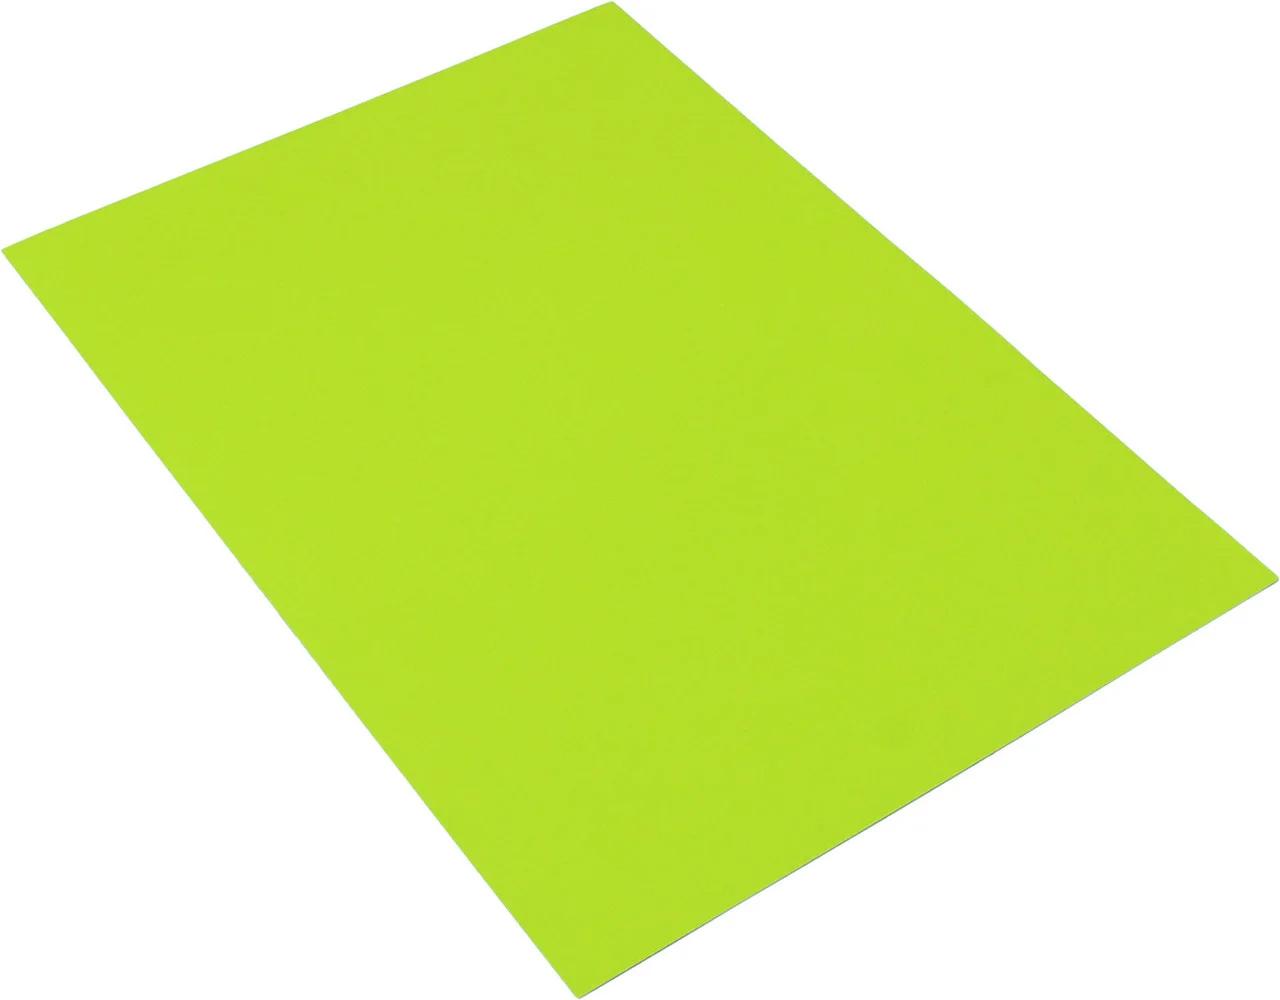 Бумага цветная Color Cyber A4 неон 80гр./м2. Green, 100листов, зелен. Spectra Color - фото 2